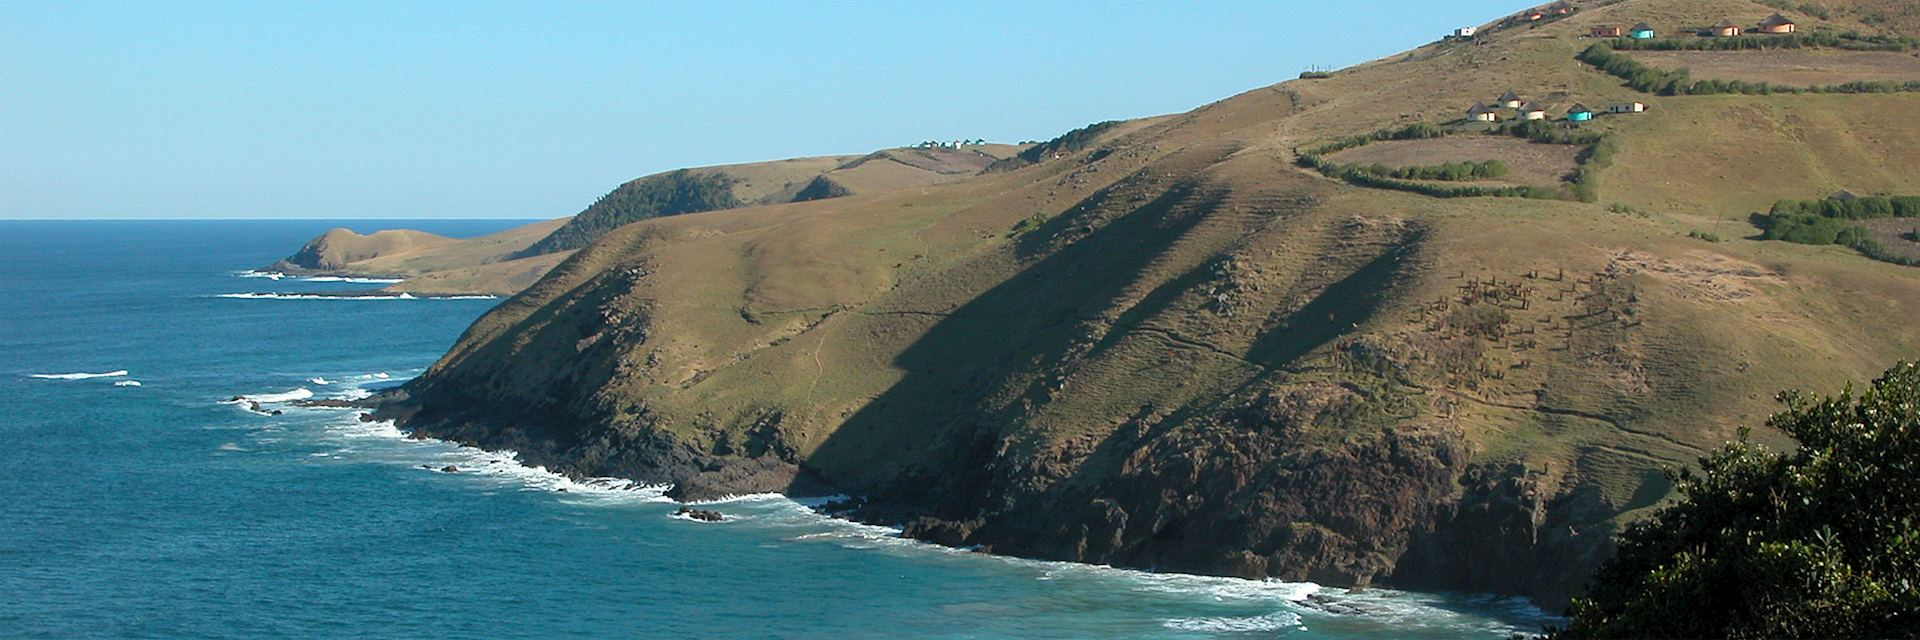 Wild Coast Coastline at Coffee Bay